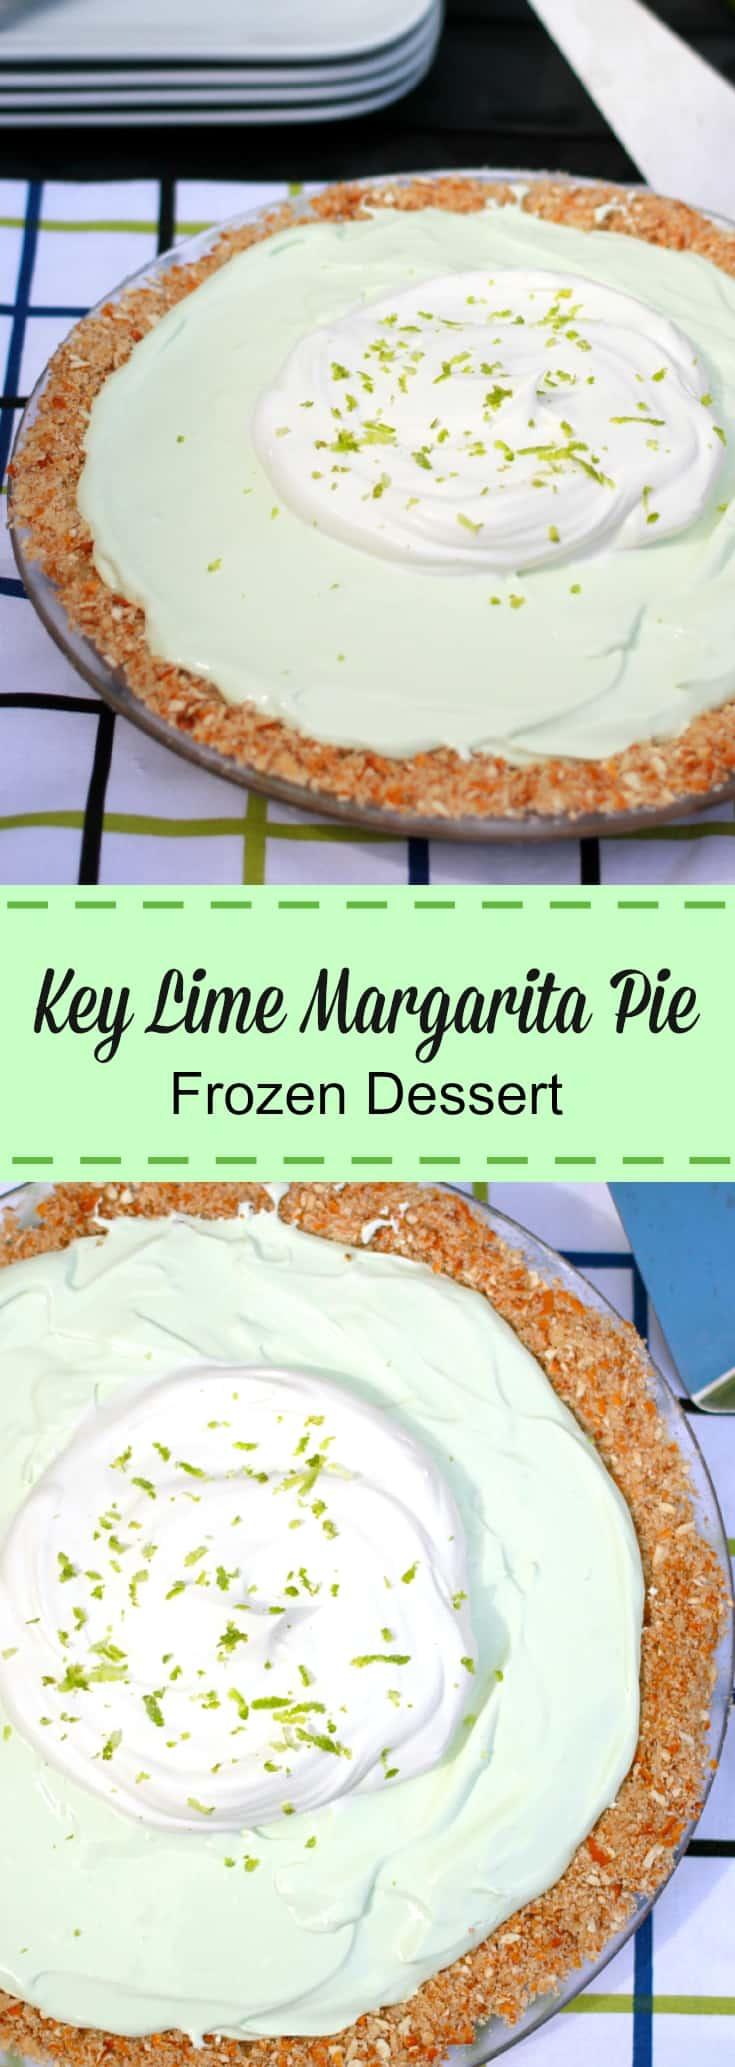 Key-Lime-Margarita-Pie-frozen-dessert-recipe